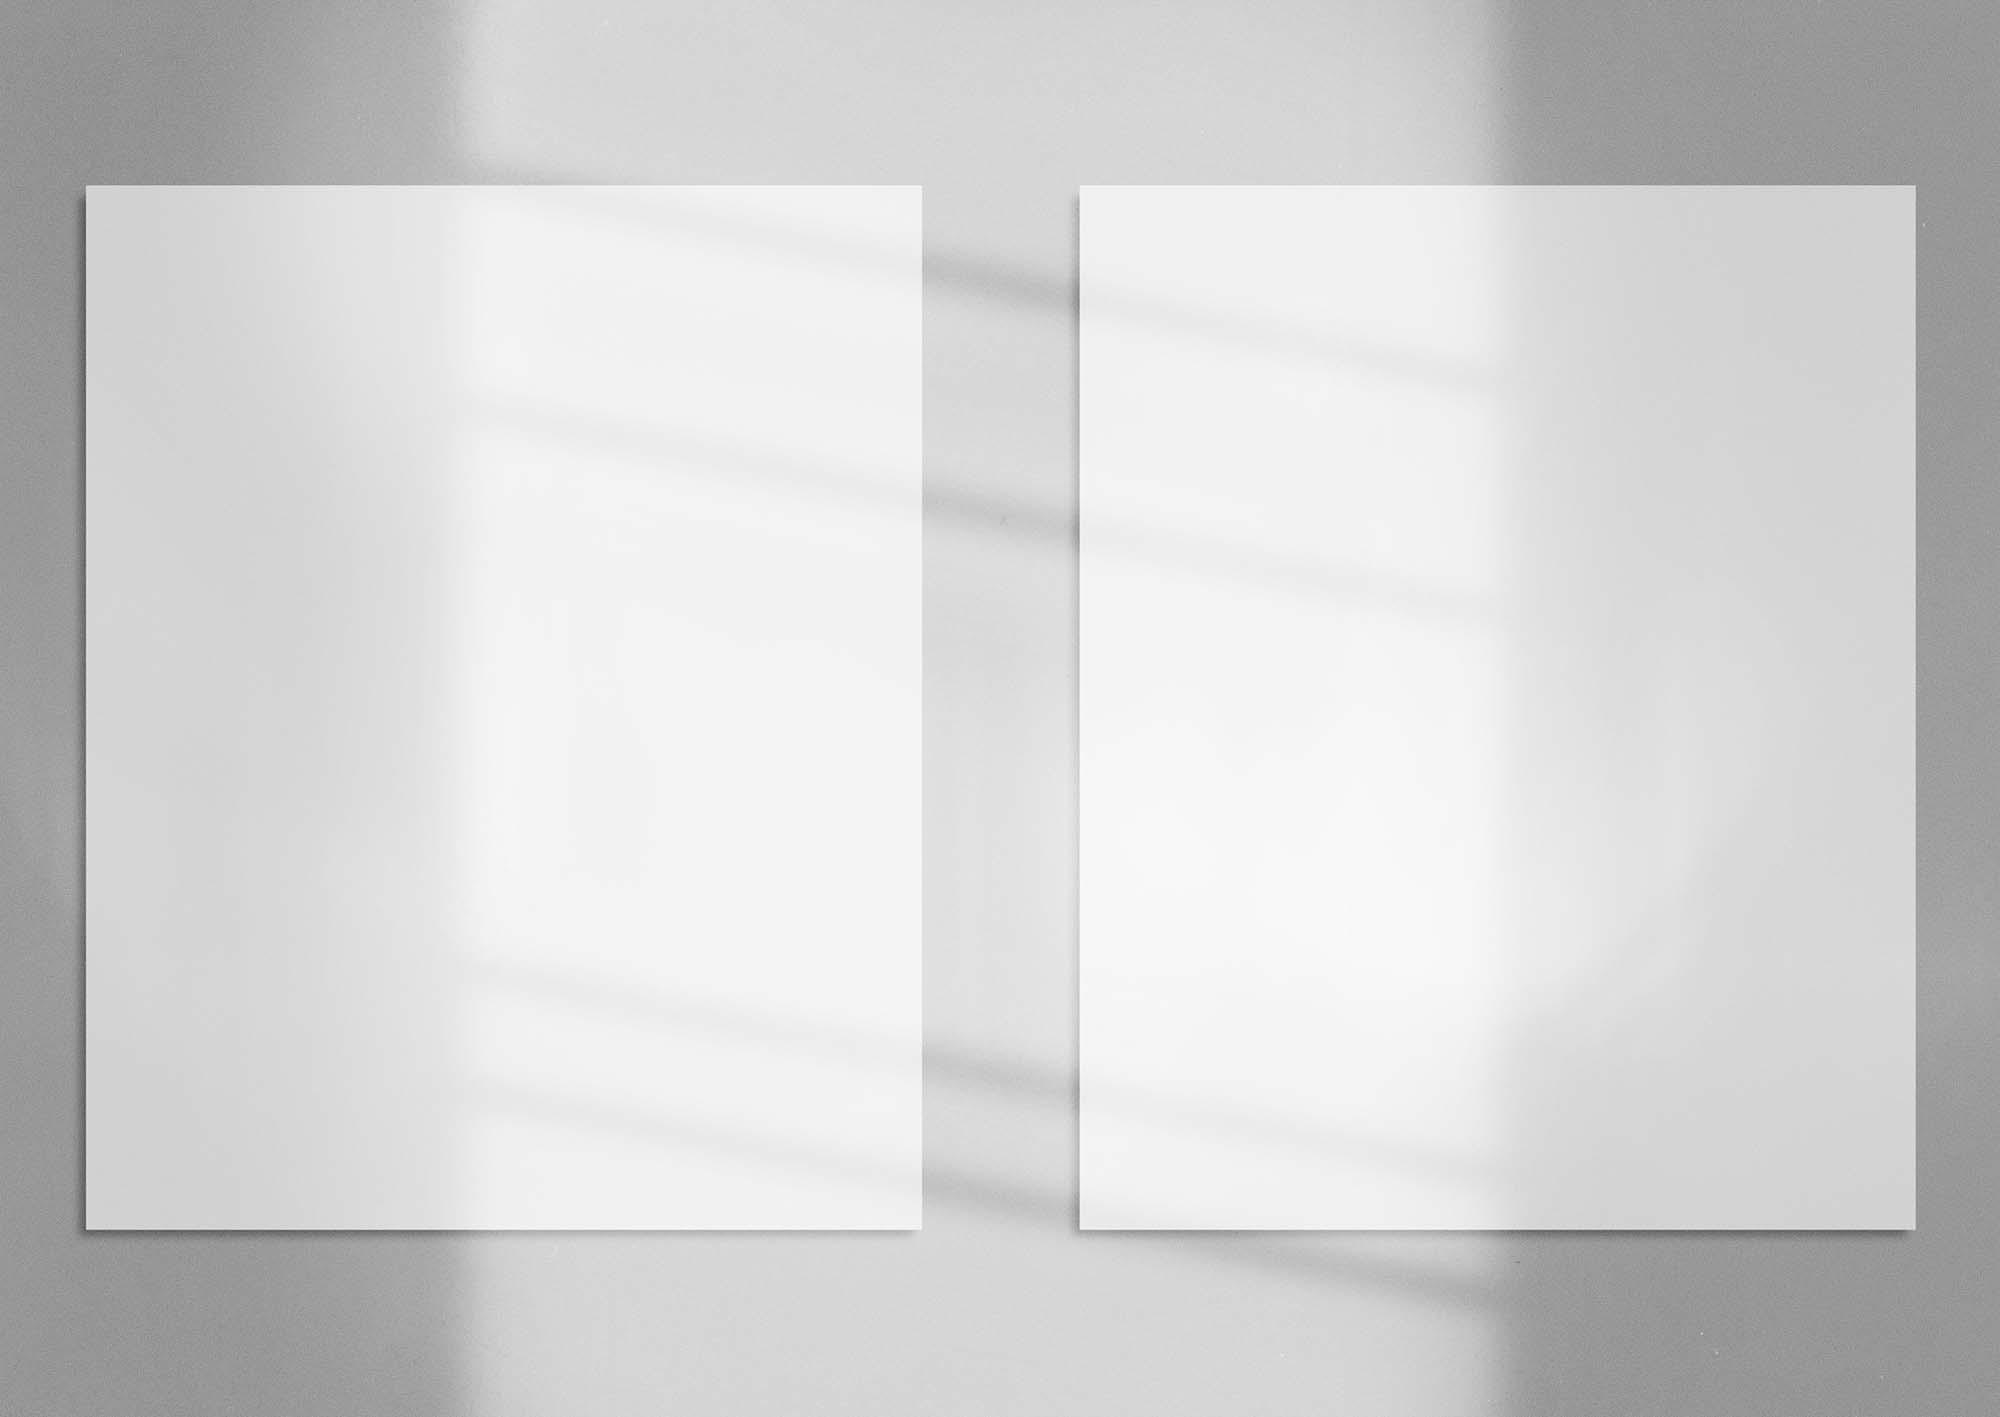 Realistic Shadowed Poster Mockup 2